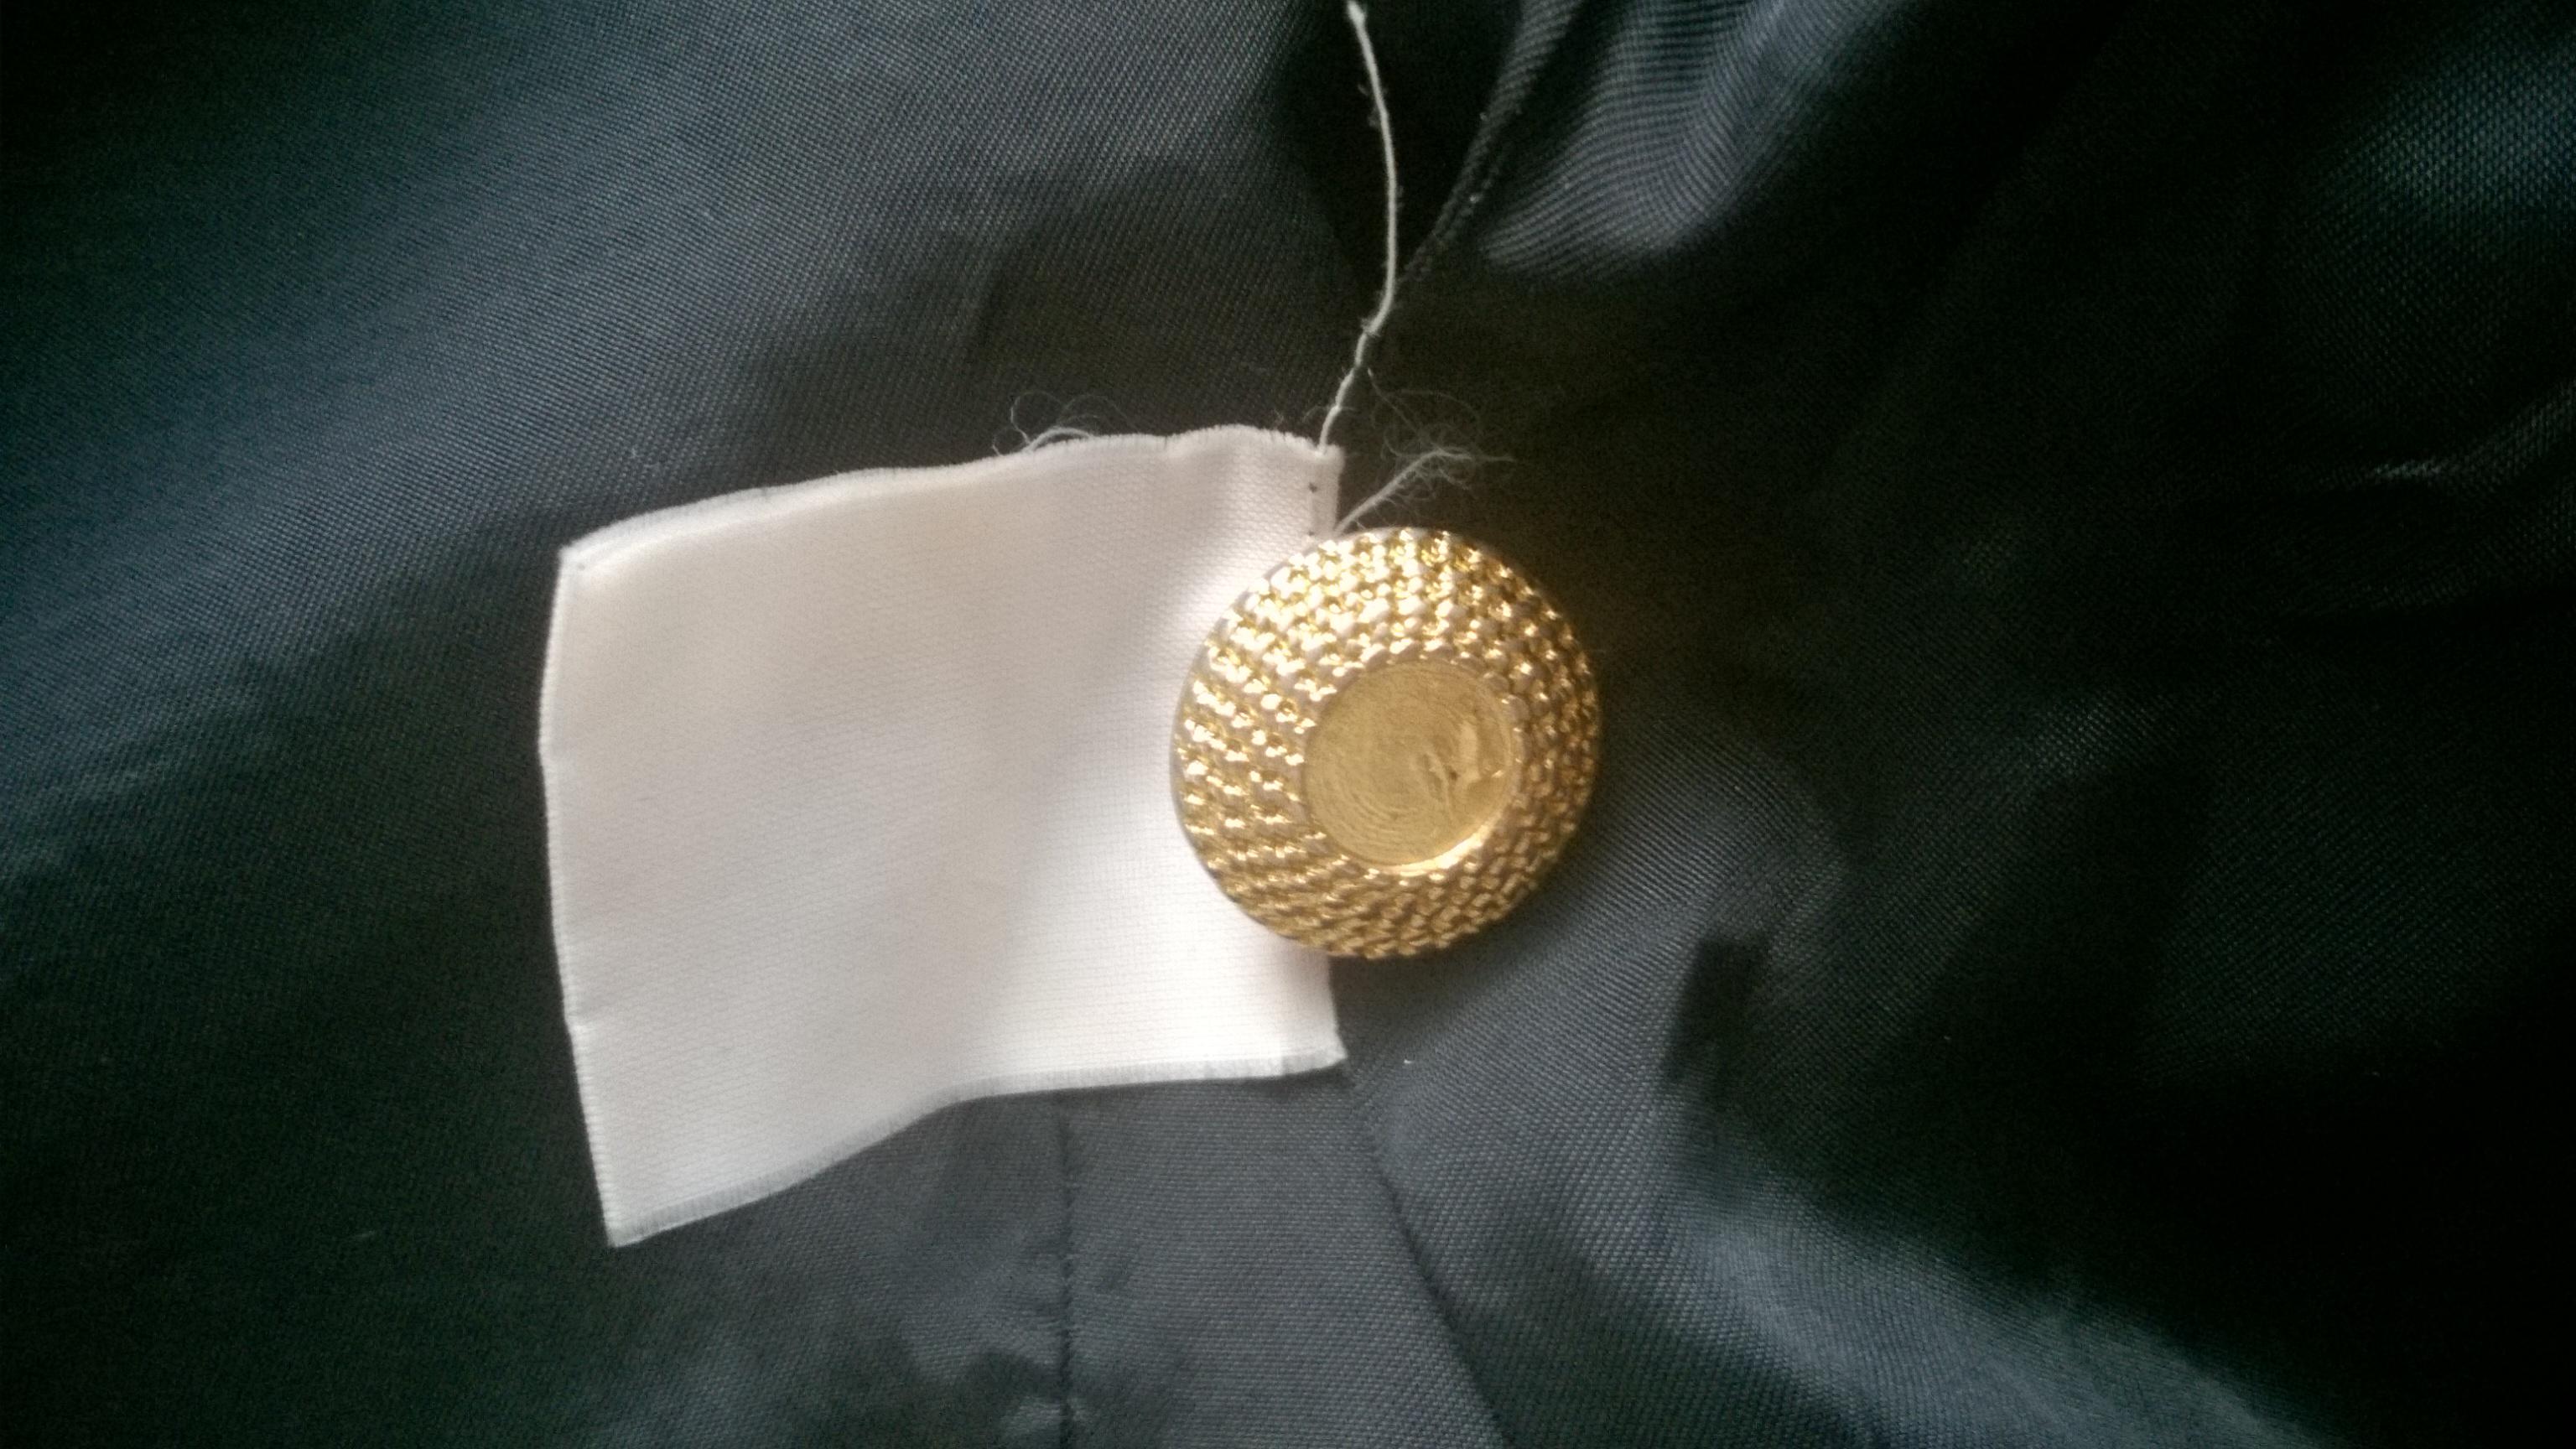 Versus Versace Coat 2 extra button inside tag.jpg